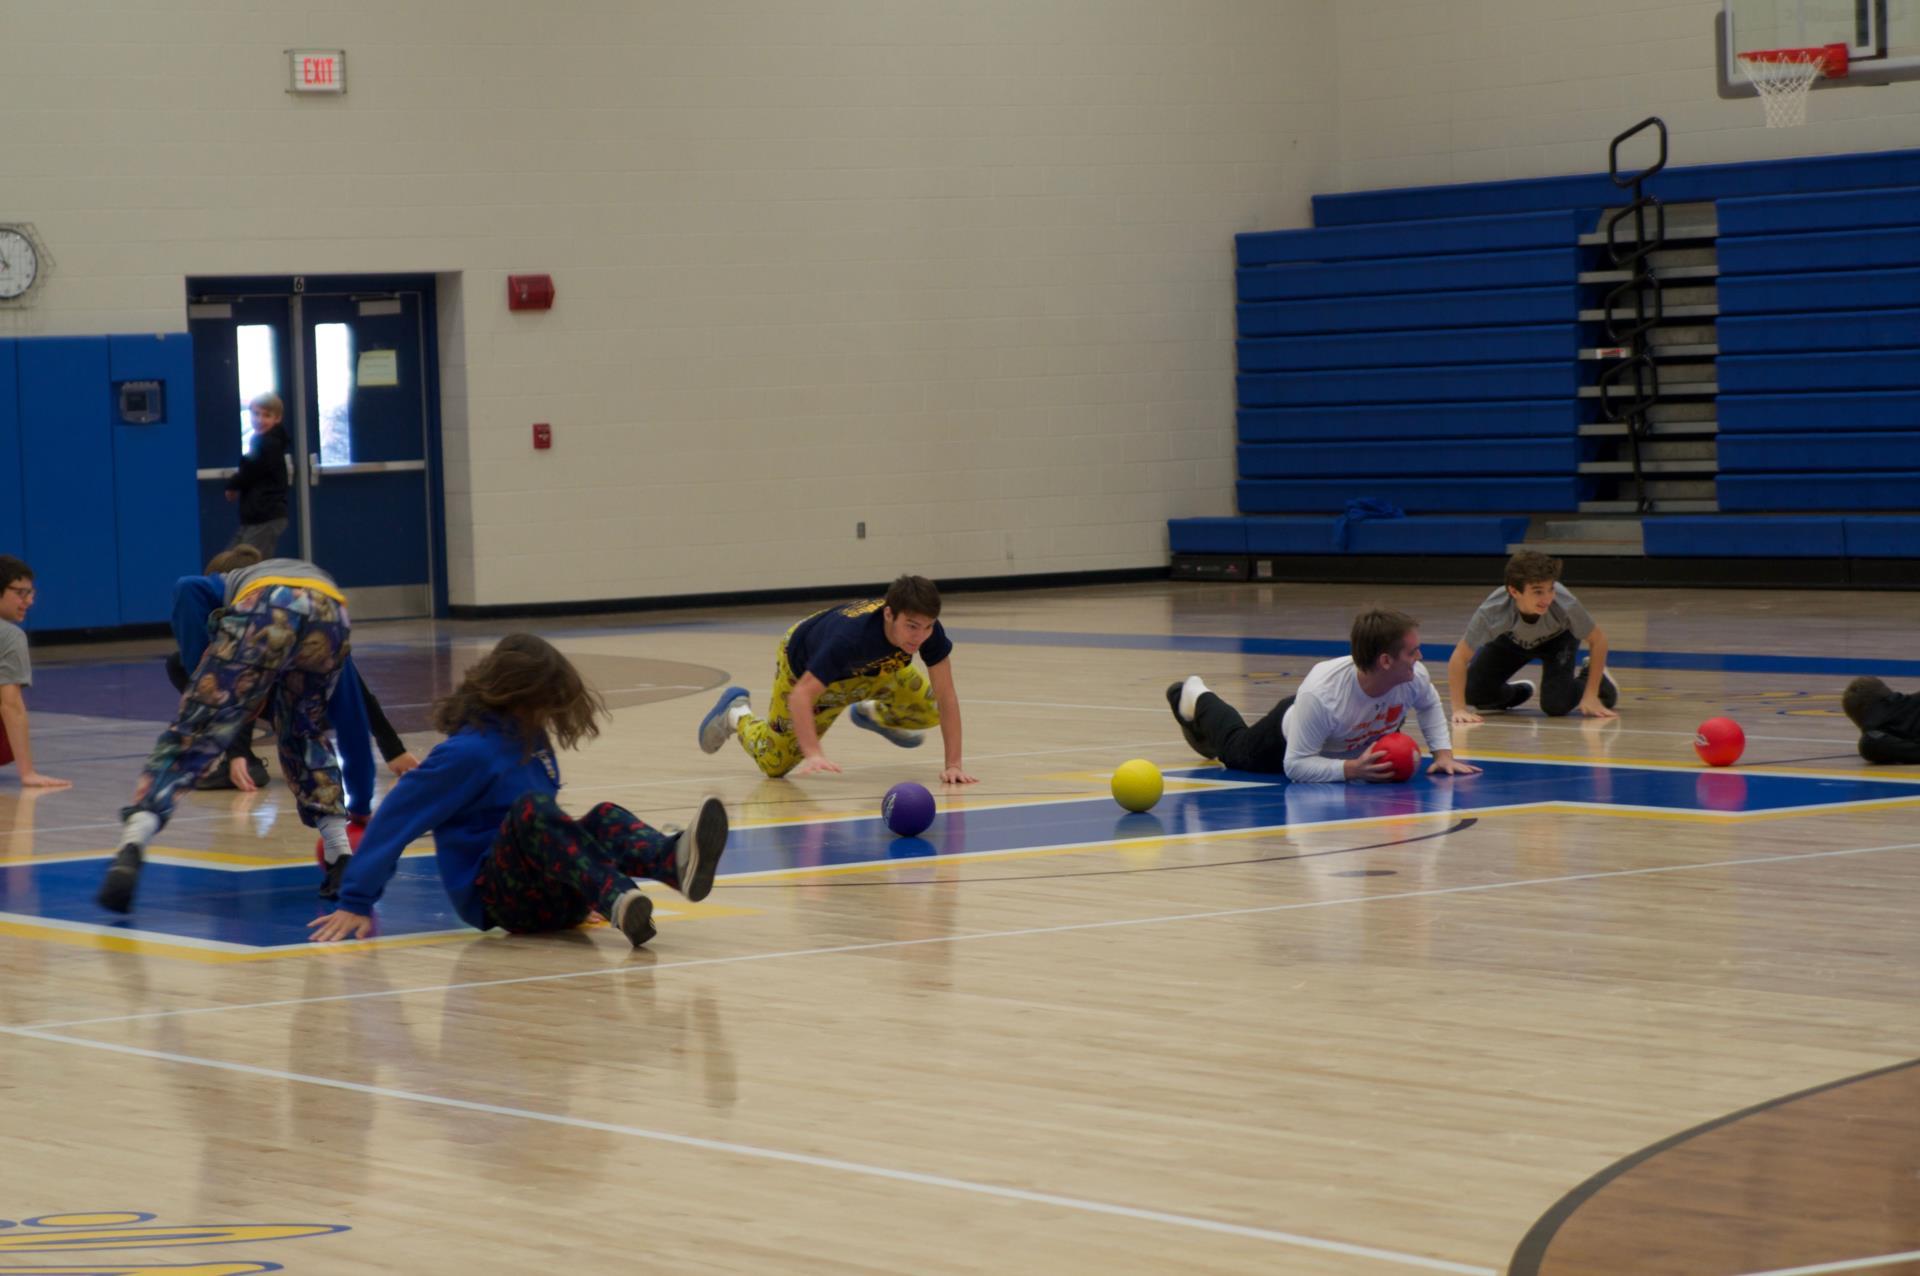 students enjoying battle ball in gym